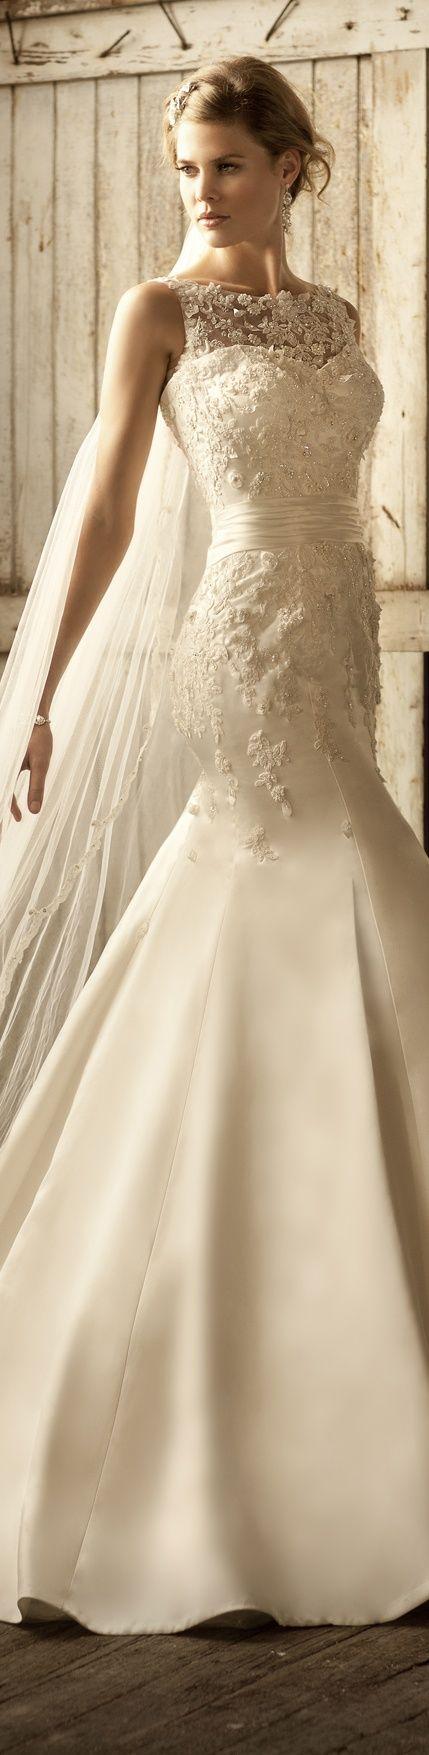 Best Beautiful Wedding Dresses for 2015 |